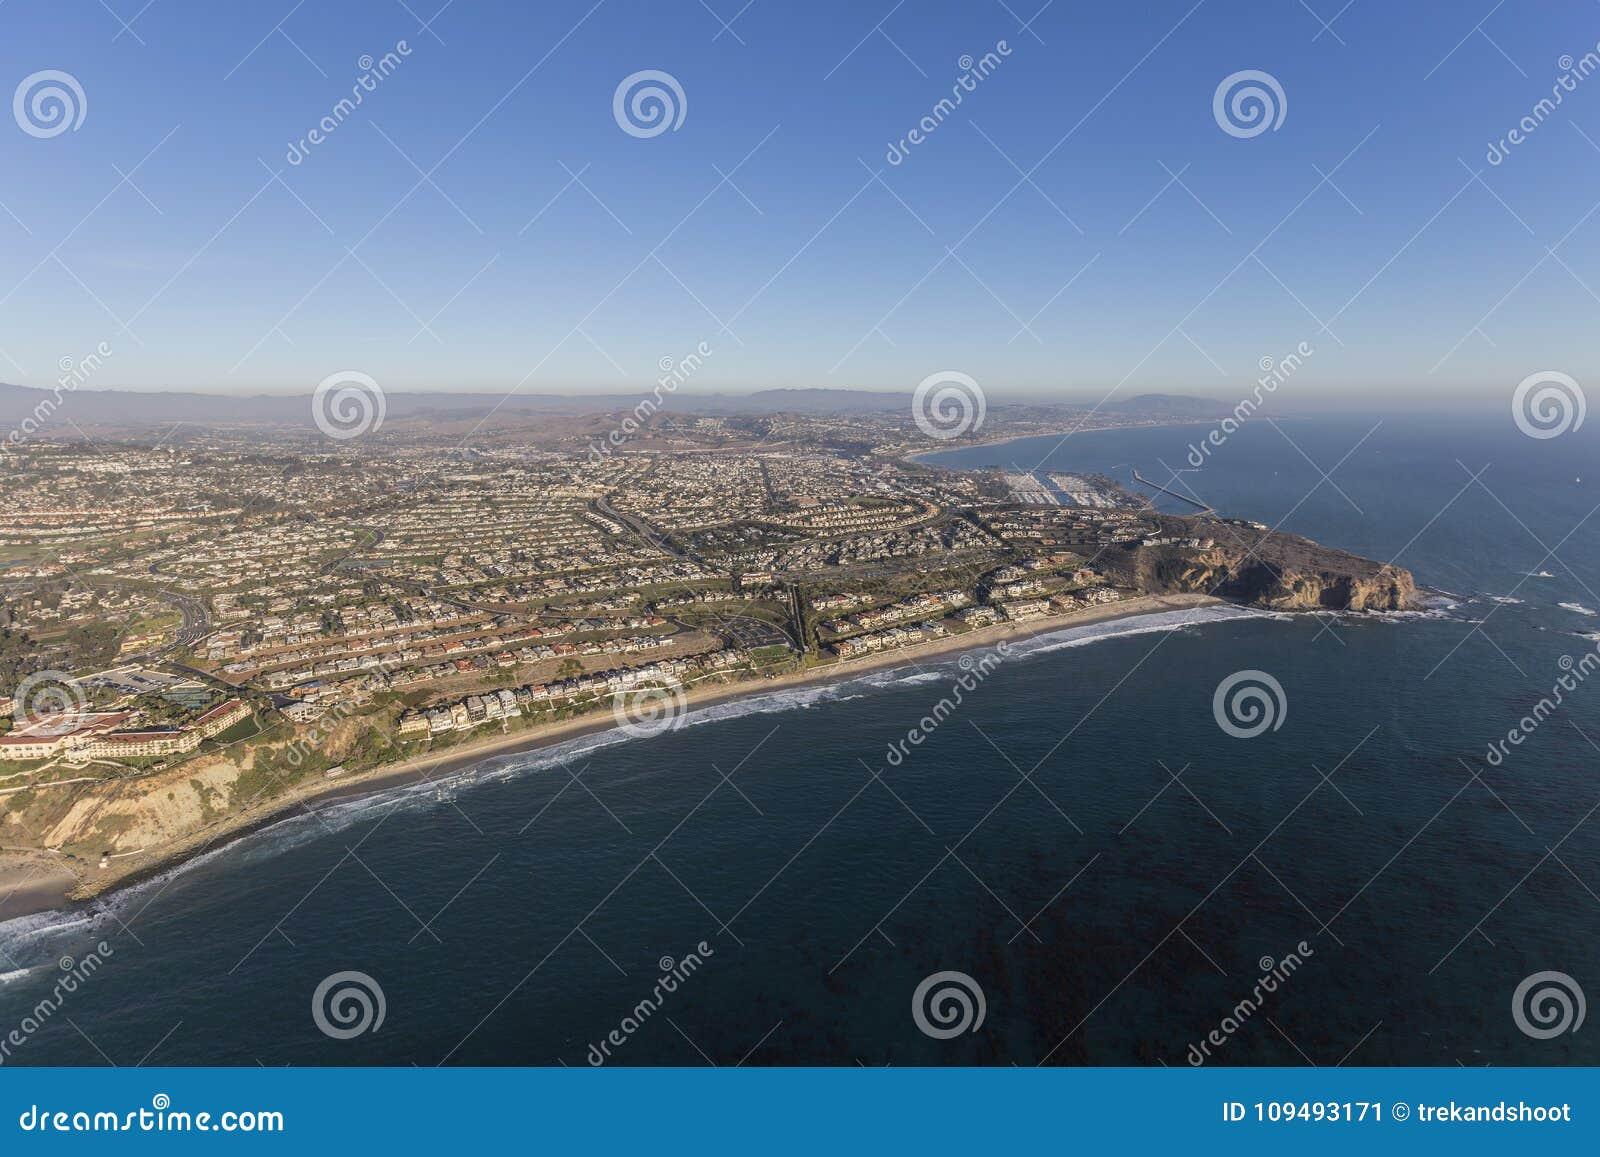 Dana Point Orange County California Coast Aerial